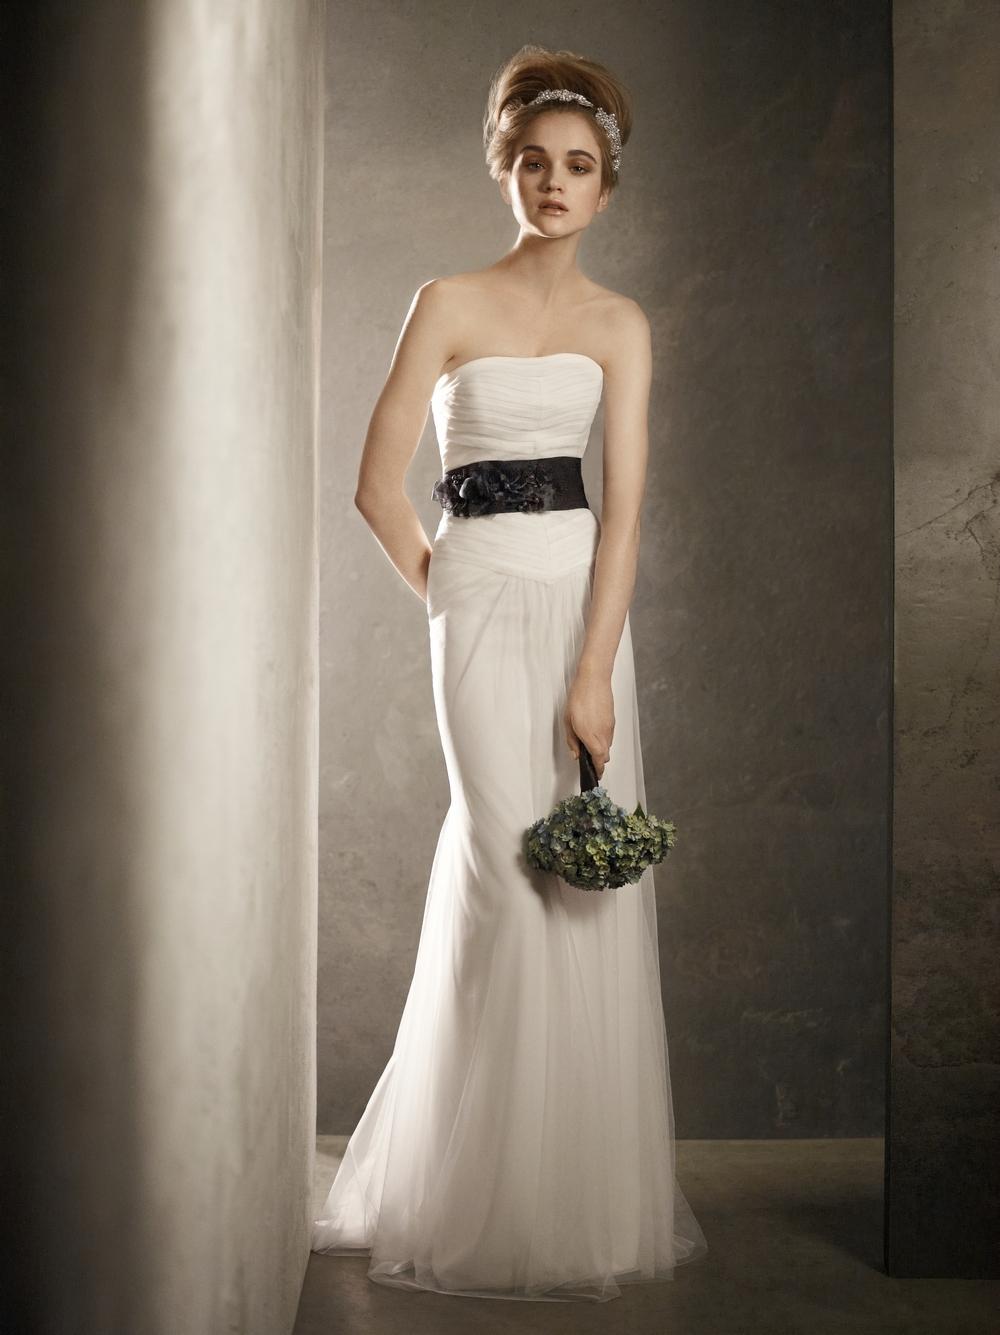 blue and white gothic wedding dresses black white wedding dress Black Wedding Dress And Fashion Gossip